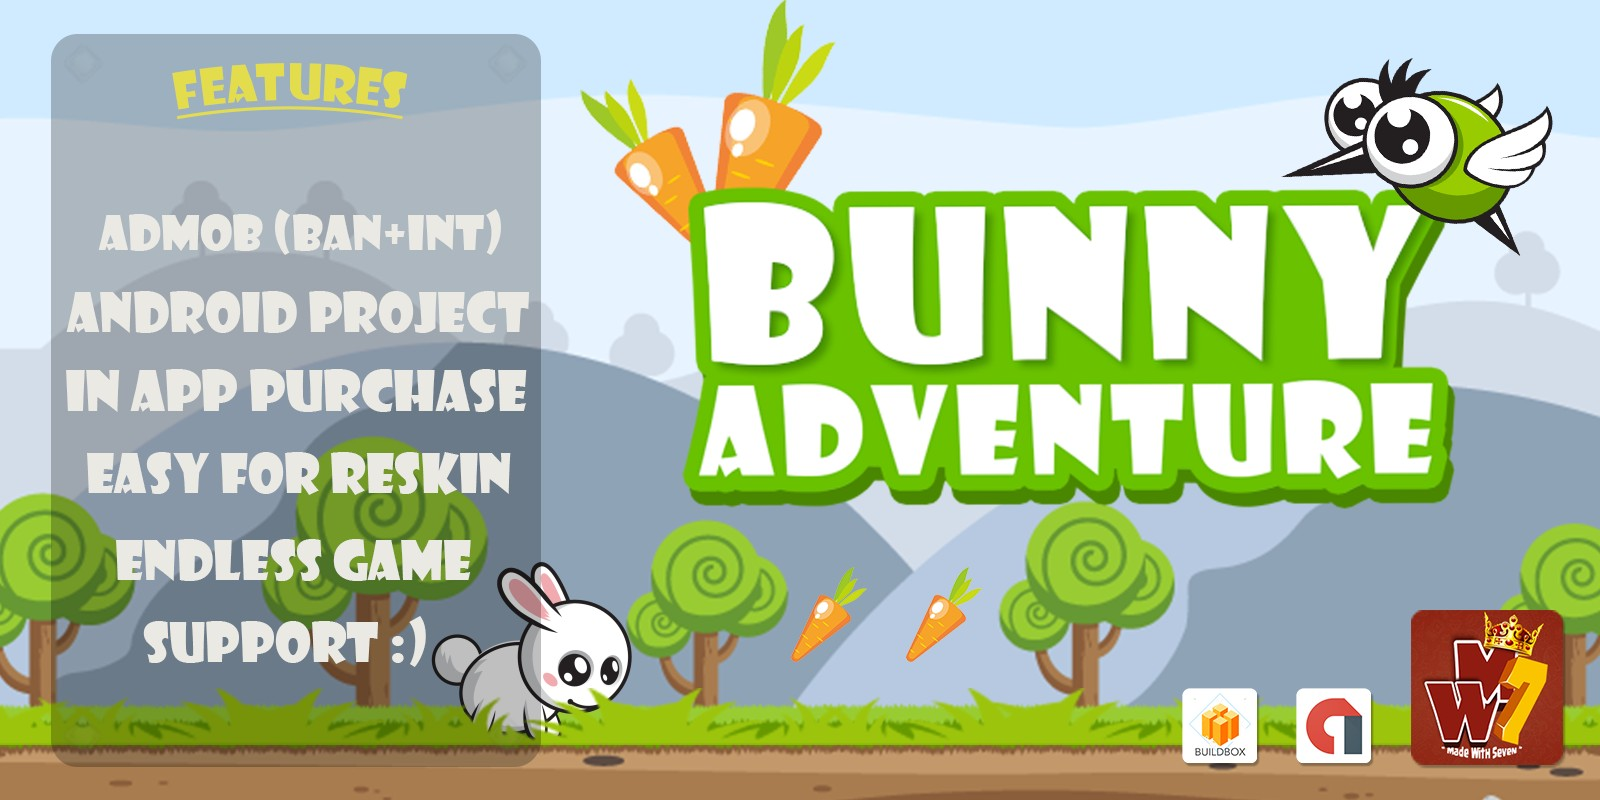 Bunny Adventure - Buildbox Template